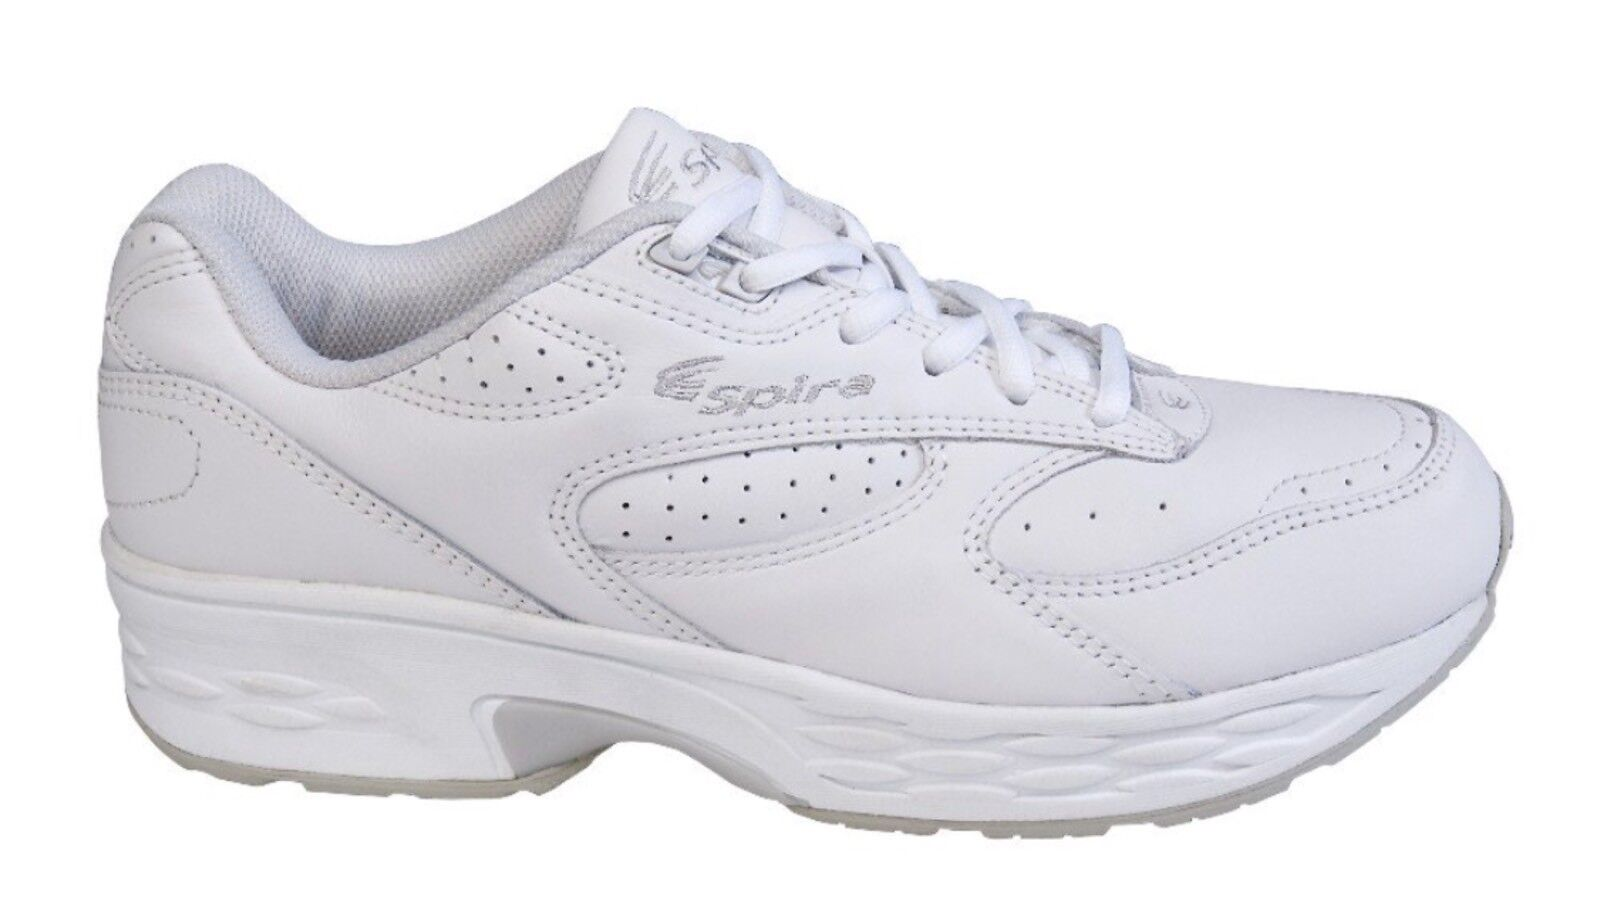 Spira Classic Leather Walking Shoe bianca Uomo Size 7  119